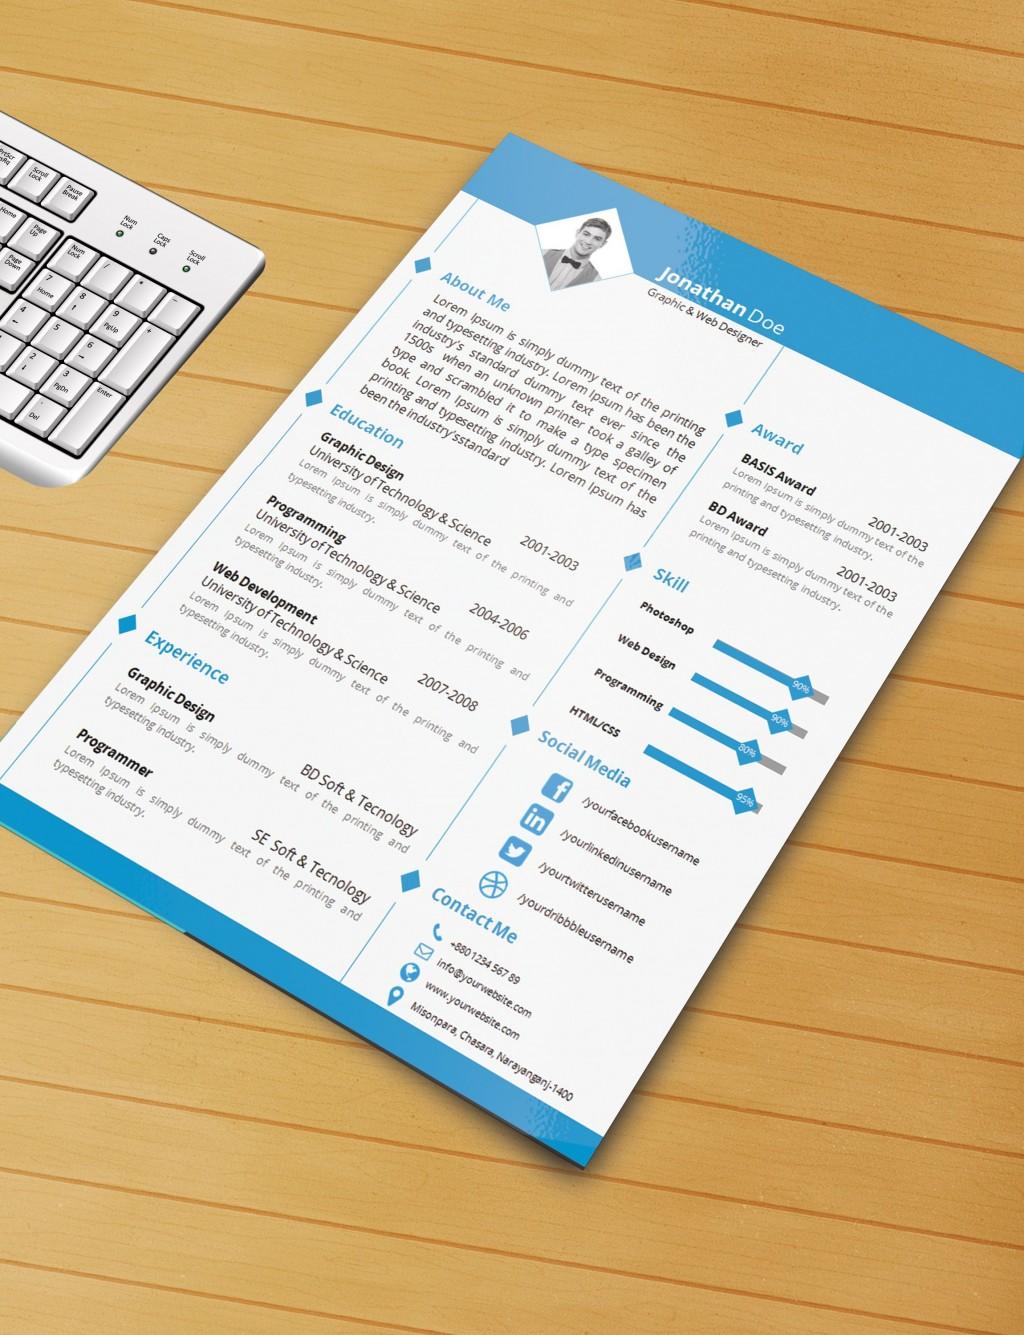 003 Imposing Microsoft Word Template Download Image  M Cv Free HeaderLarge